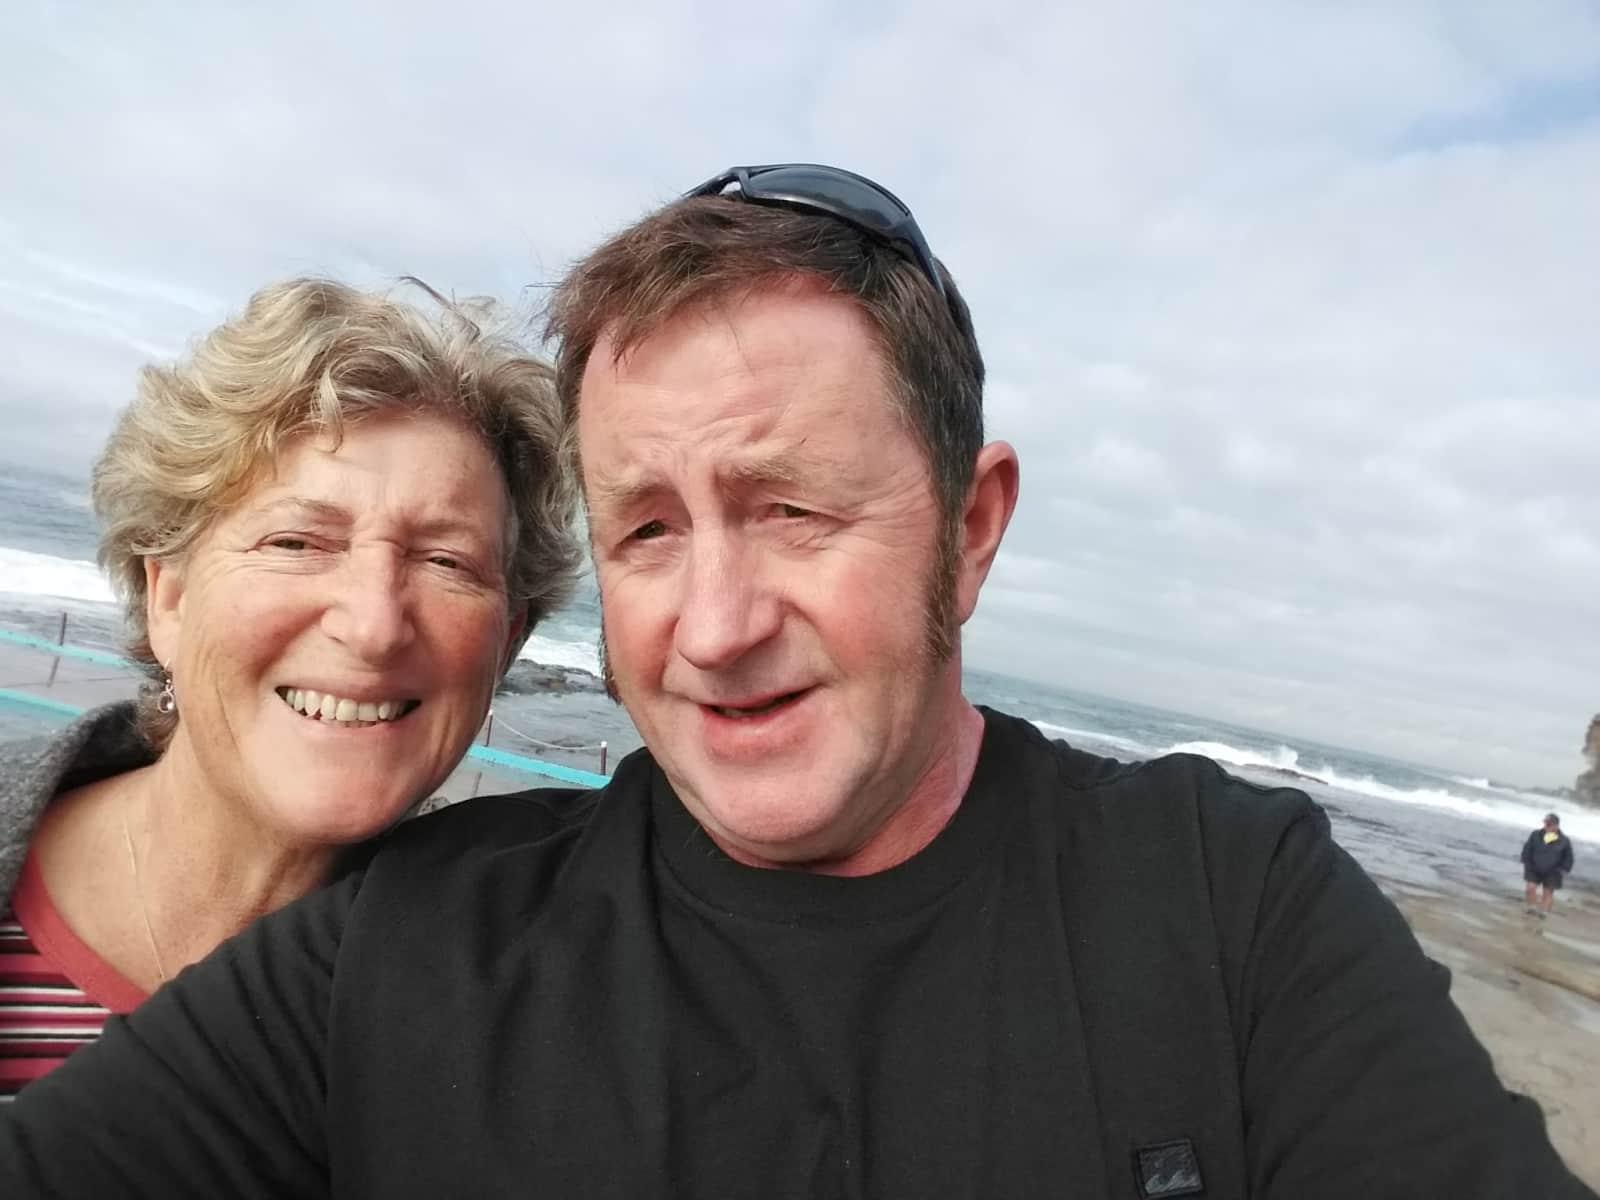 Robert & Andrea from Daylesford, Victoria, Australia